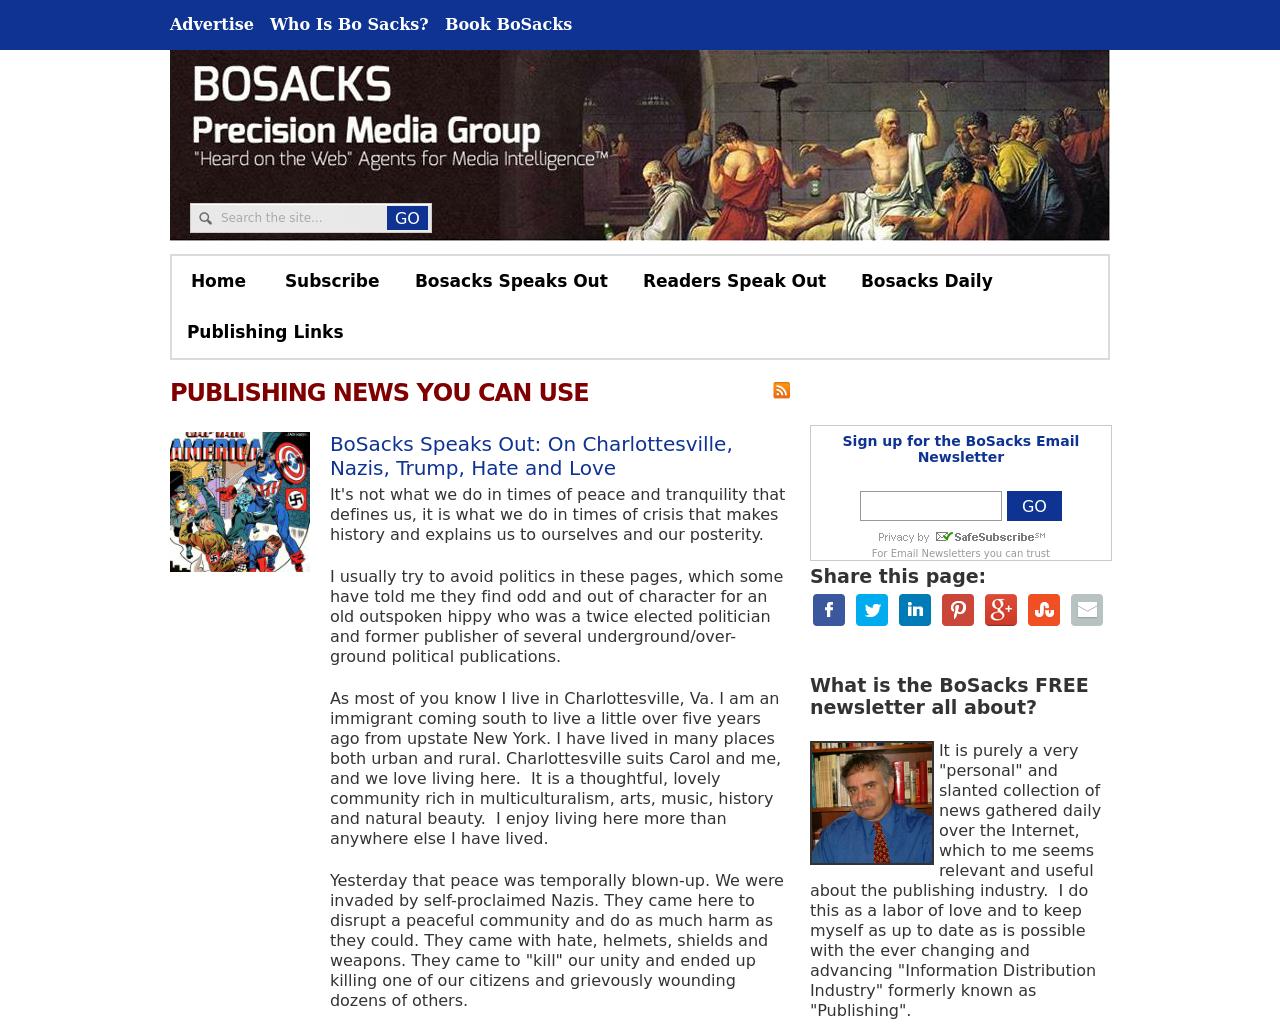 BoSacks-Precision-Media-Group-Advertising-Reviews-Pricing